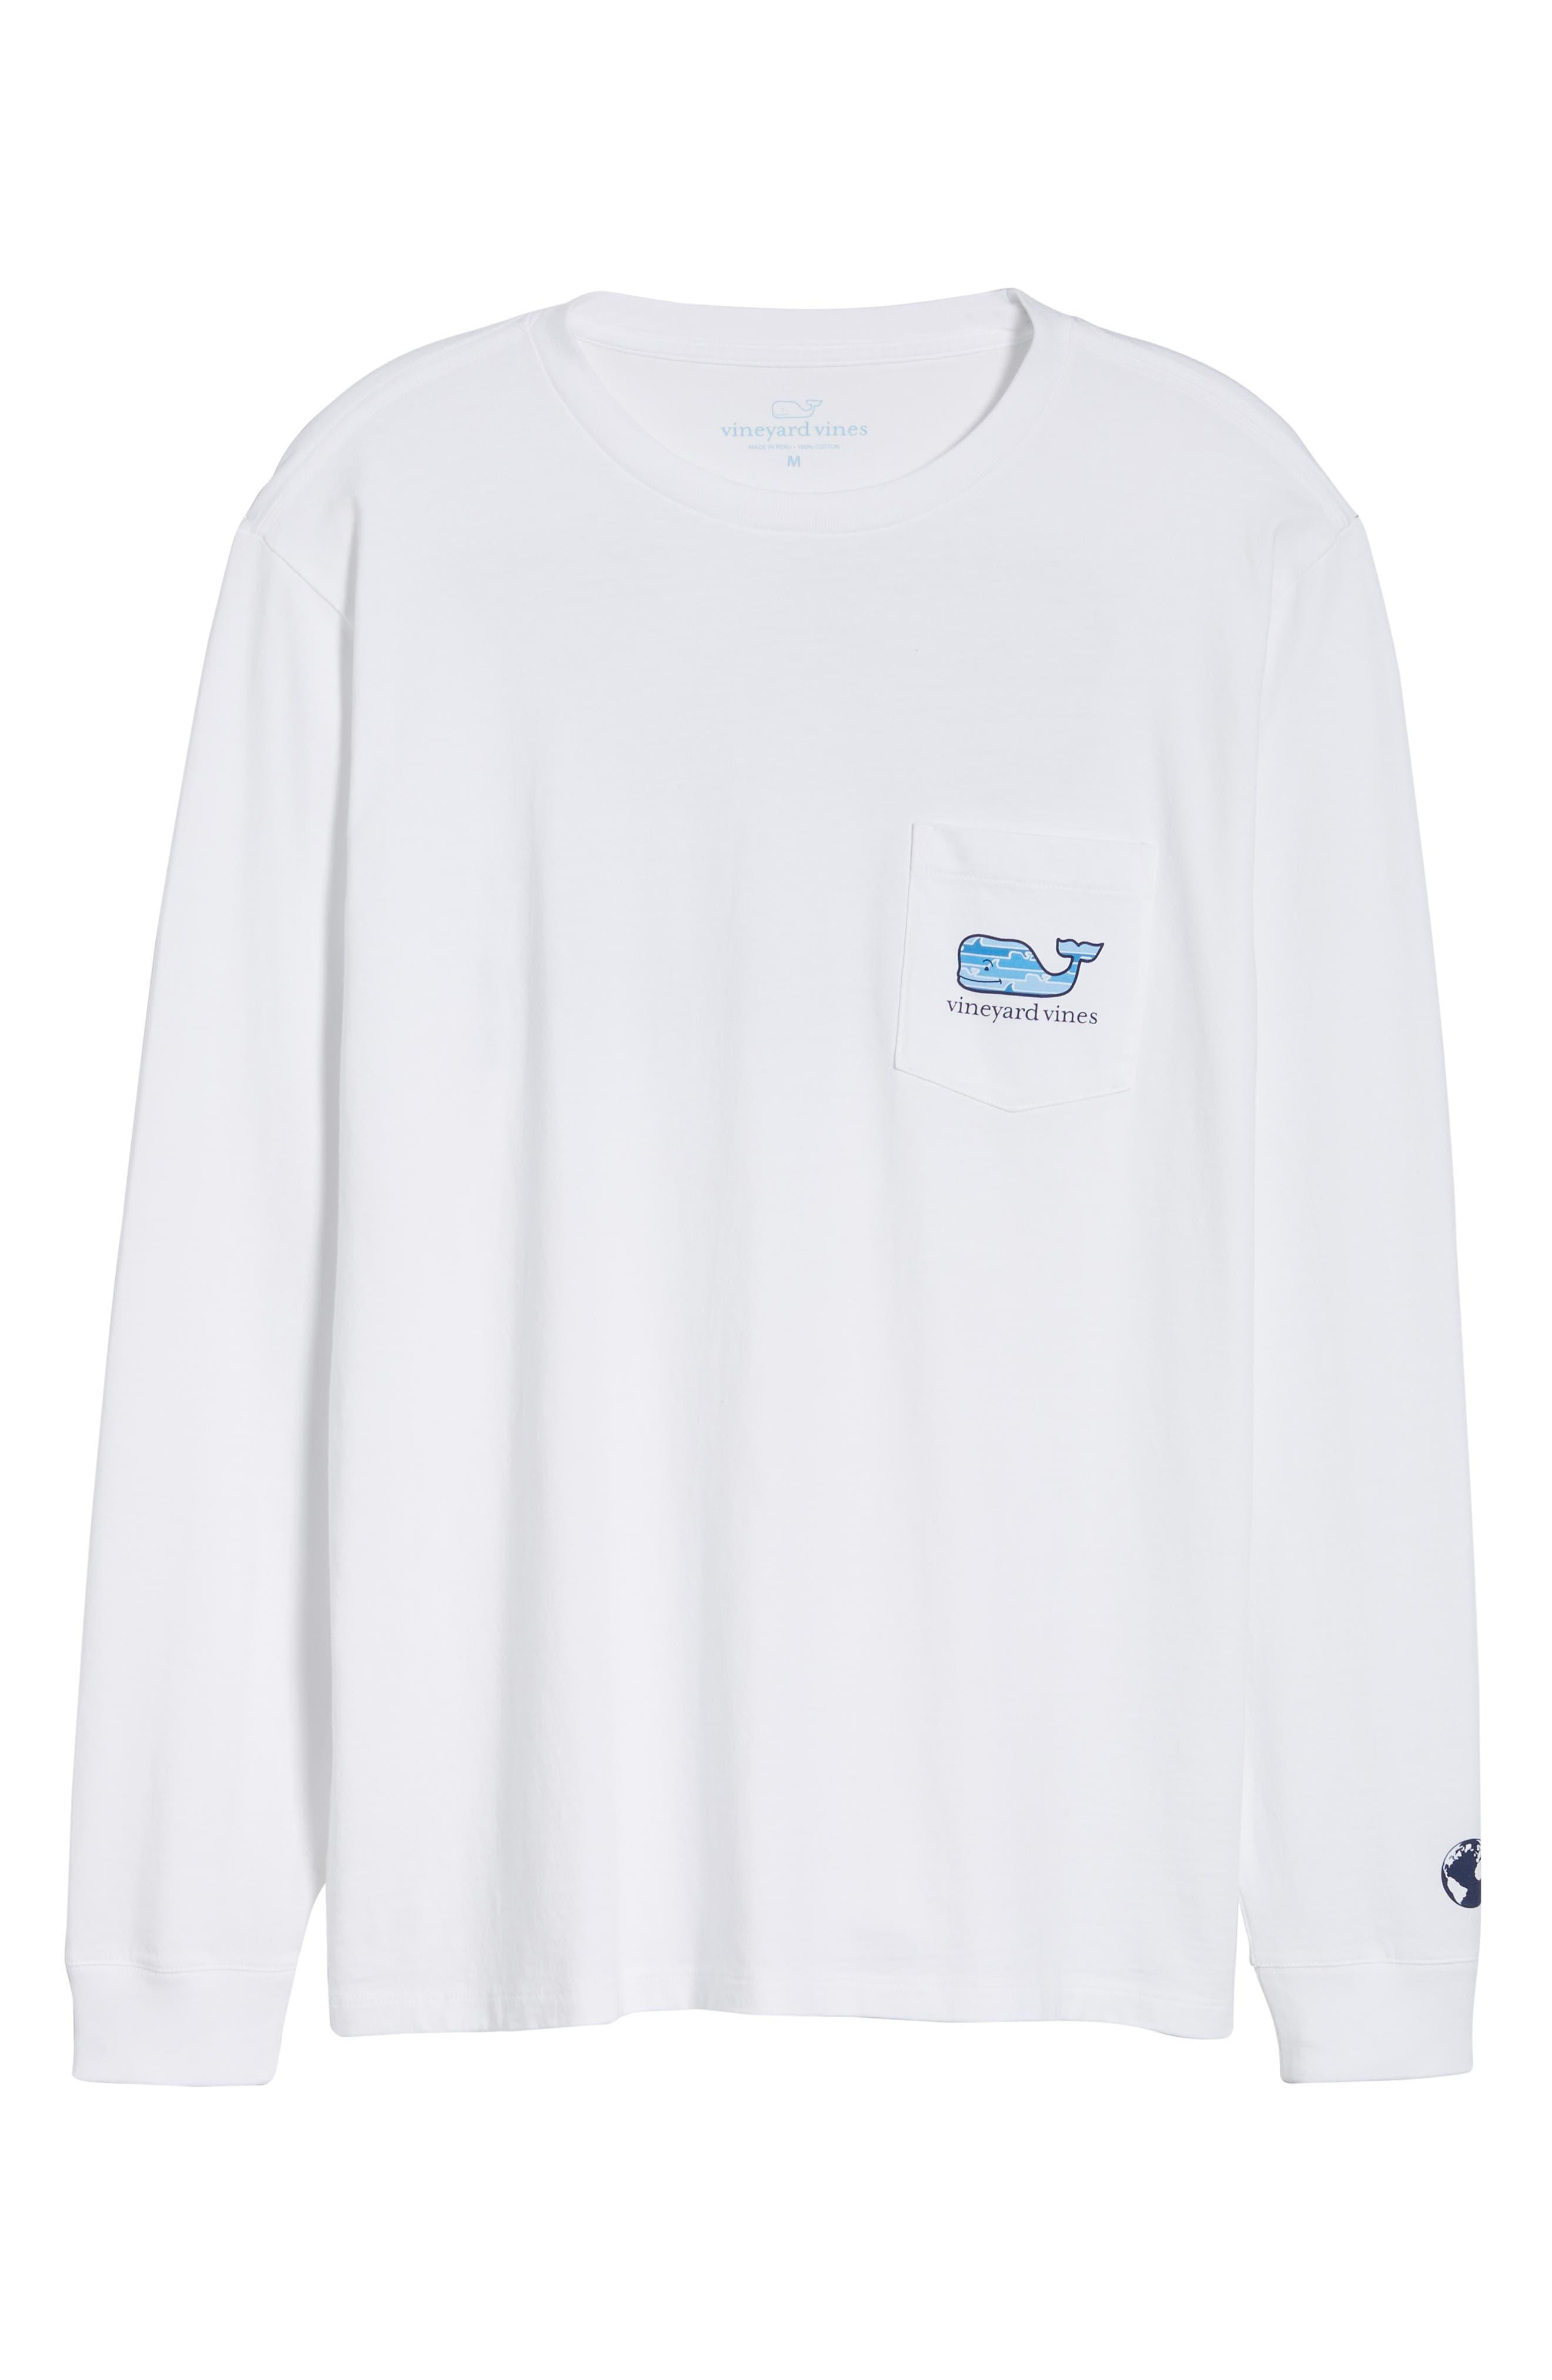 x Shark Week<sup>™</sup> Whaleline Long Sleeve Pocket T-Shirt,                             Alternate thumbnail 6, color,                             100